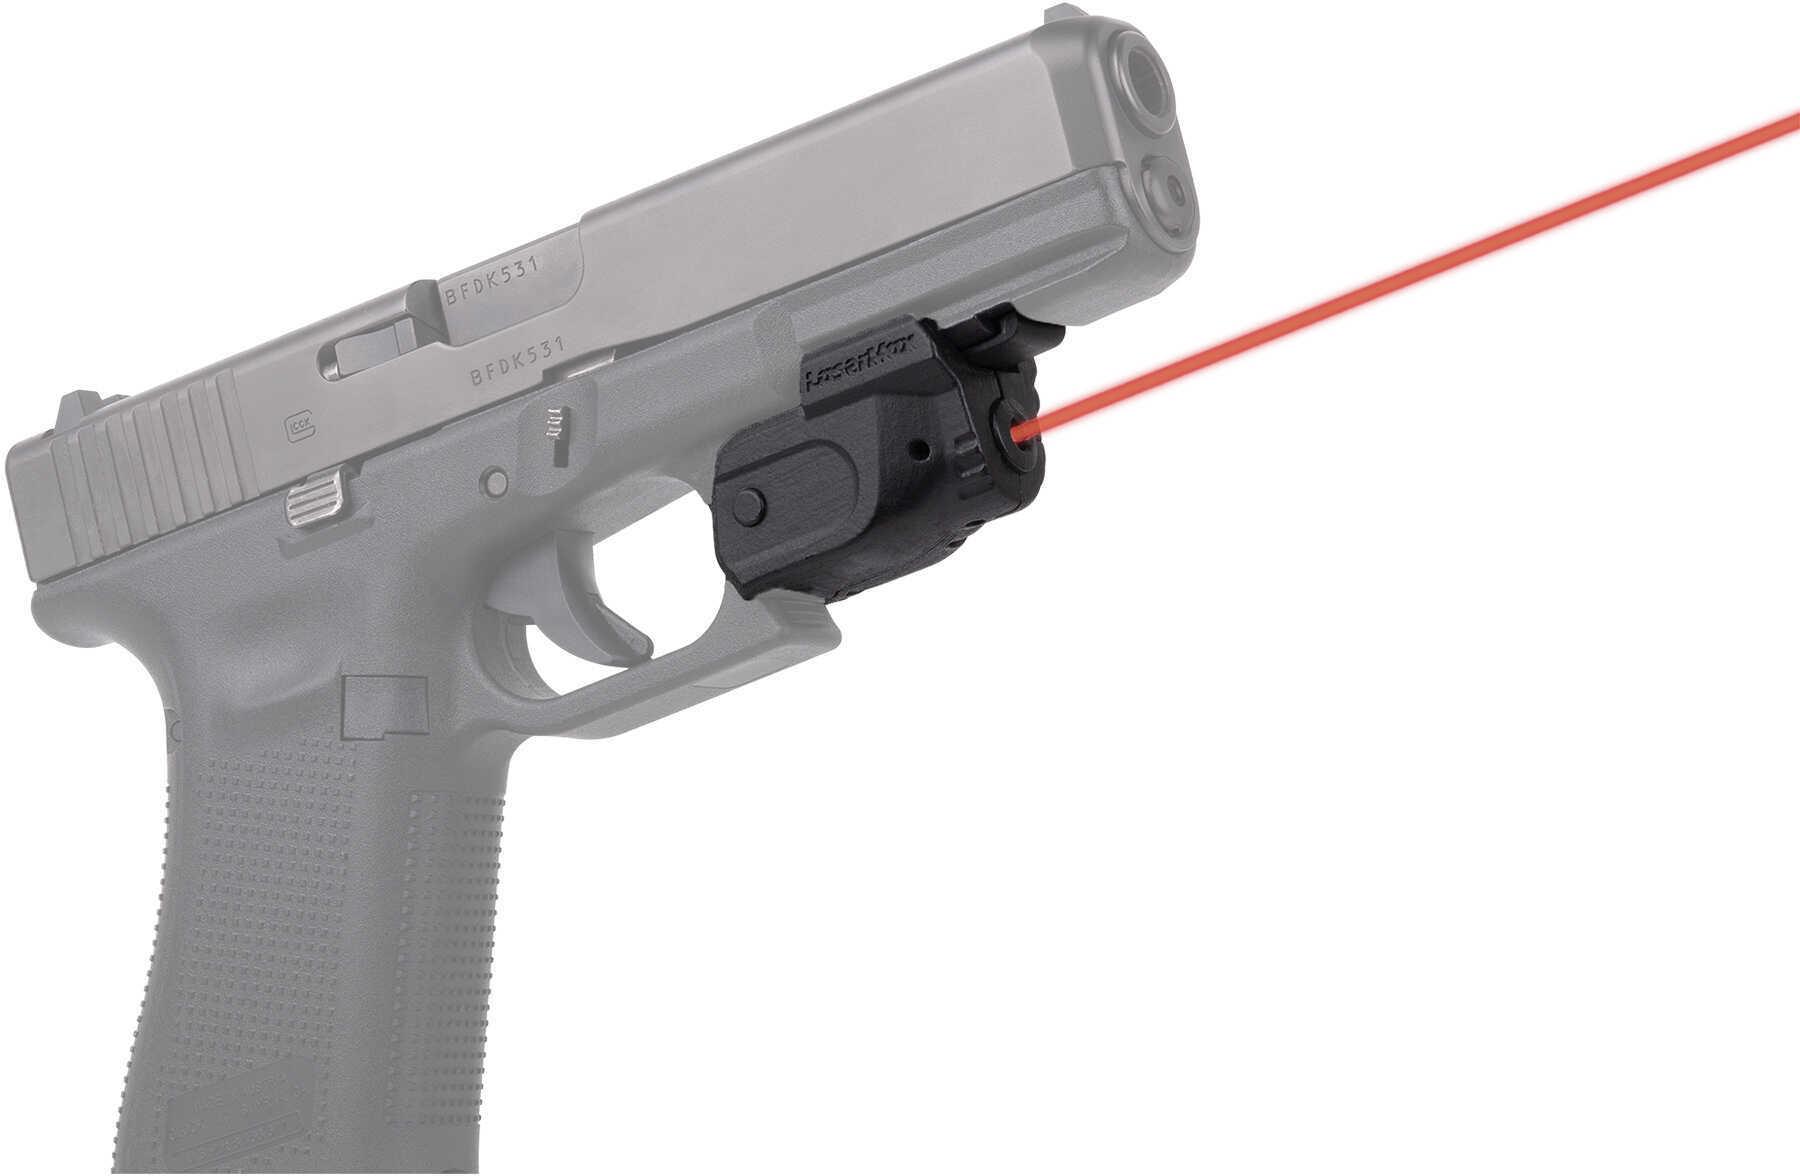 LaserMax Lightning Universal Rail Mounted Red Laser With GripSense Technology Matte Black Housing